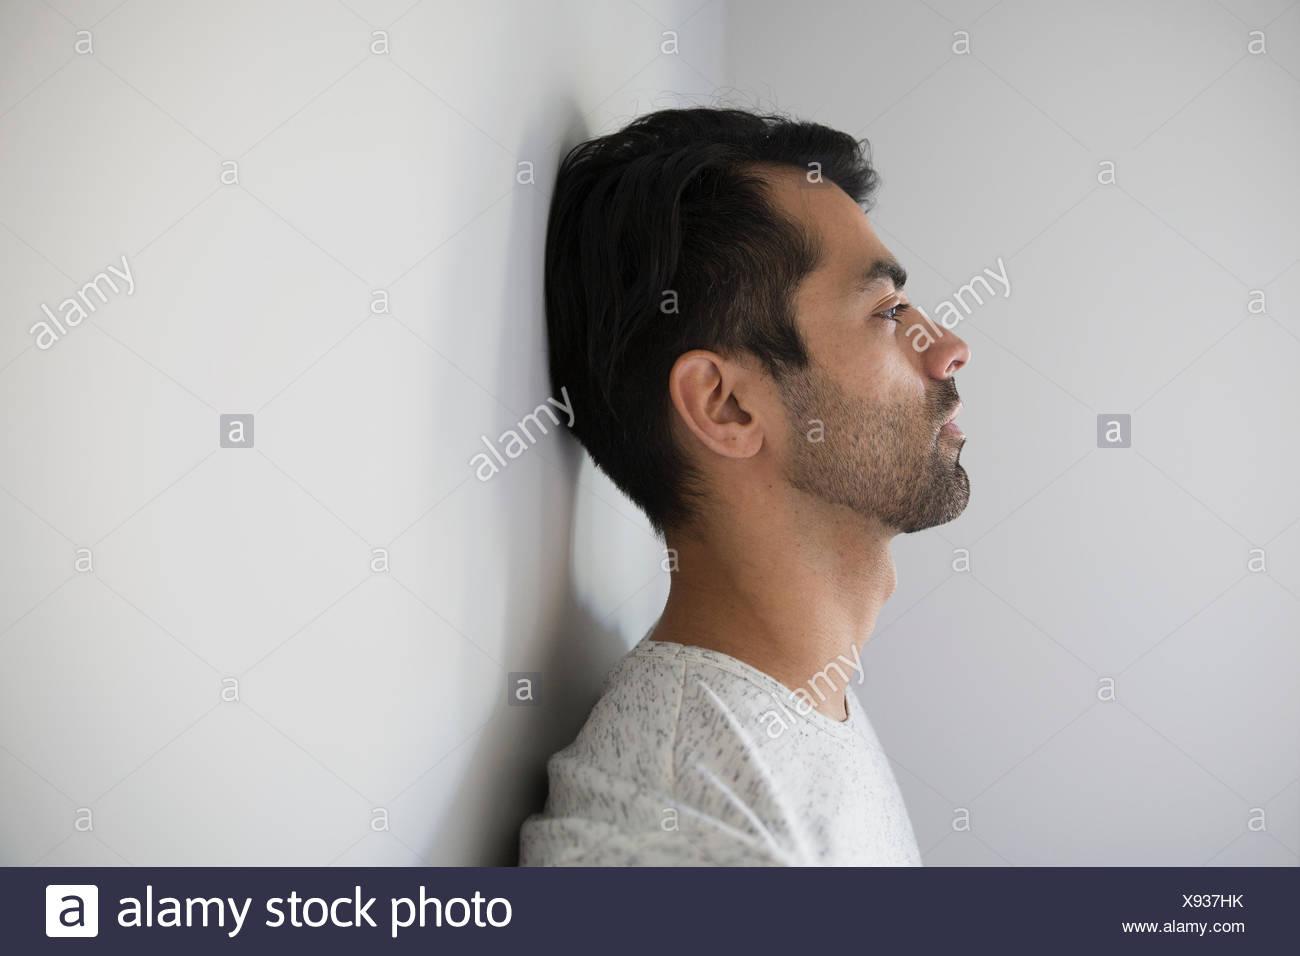 Profil de pensive man looking away Photo Stock